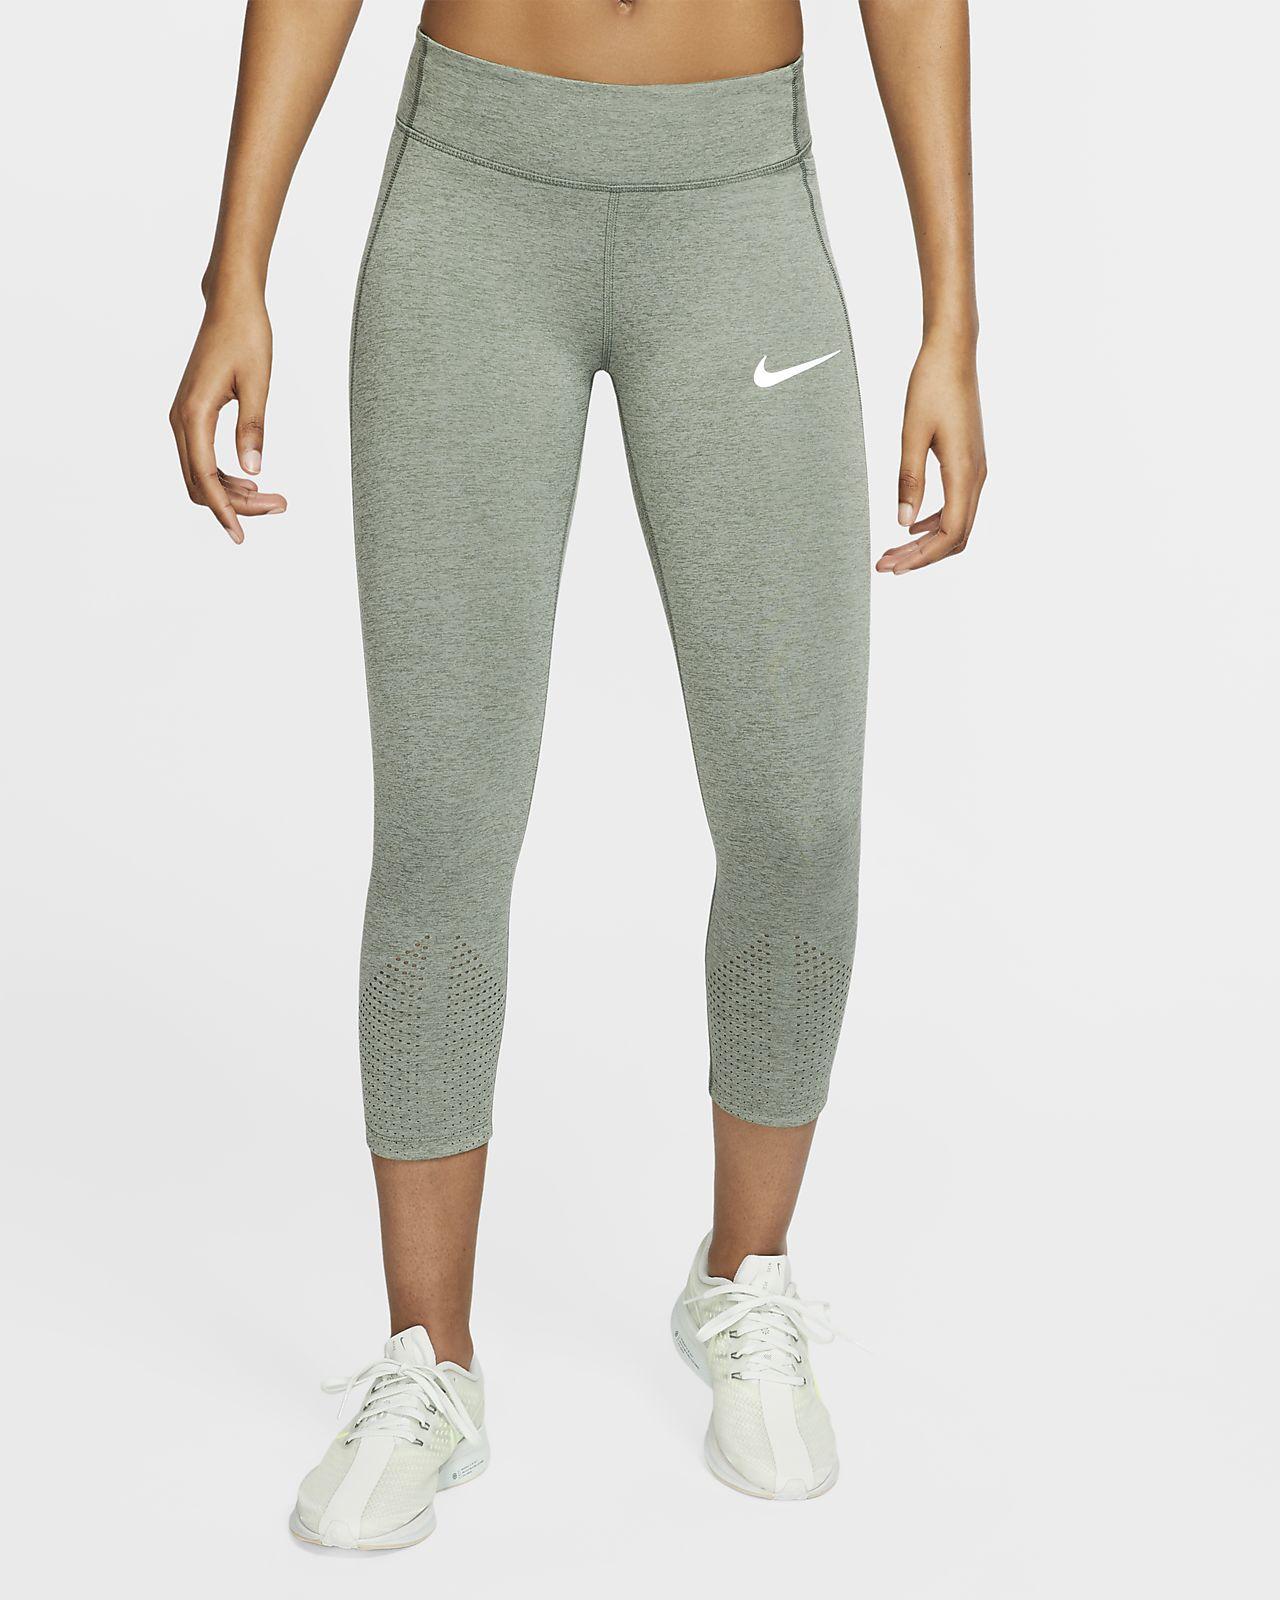 Corsários de running Nike Epic Lux para mulher